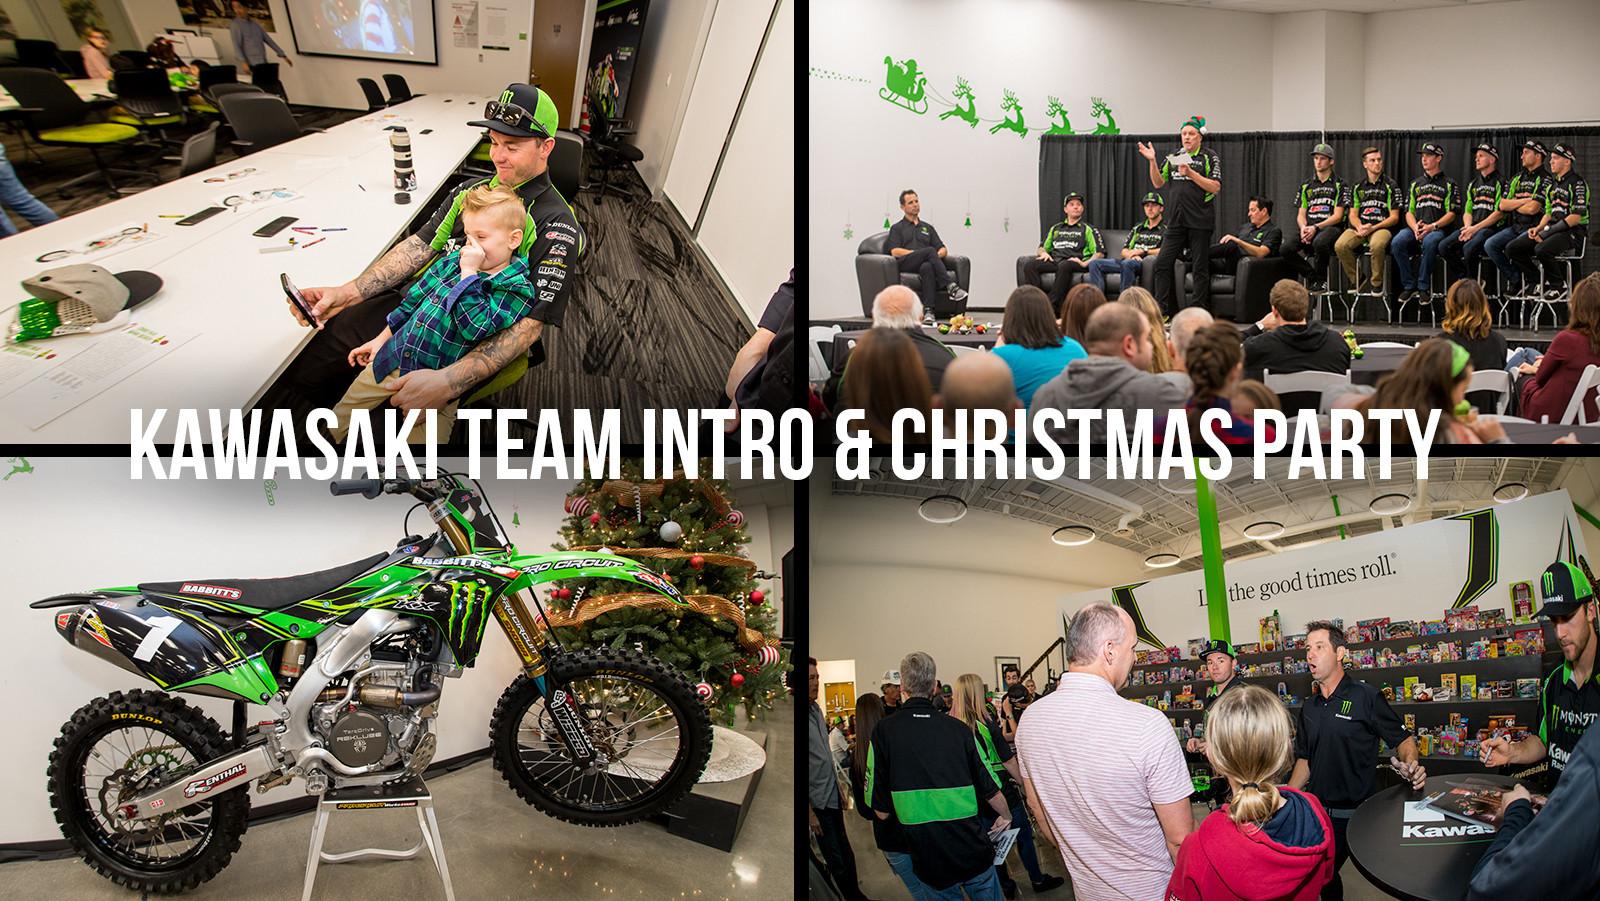 Kawasaki Christmas Party - Team Intro for Supercross and Arenacross